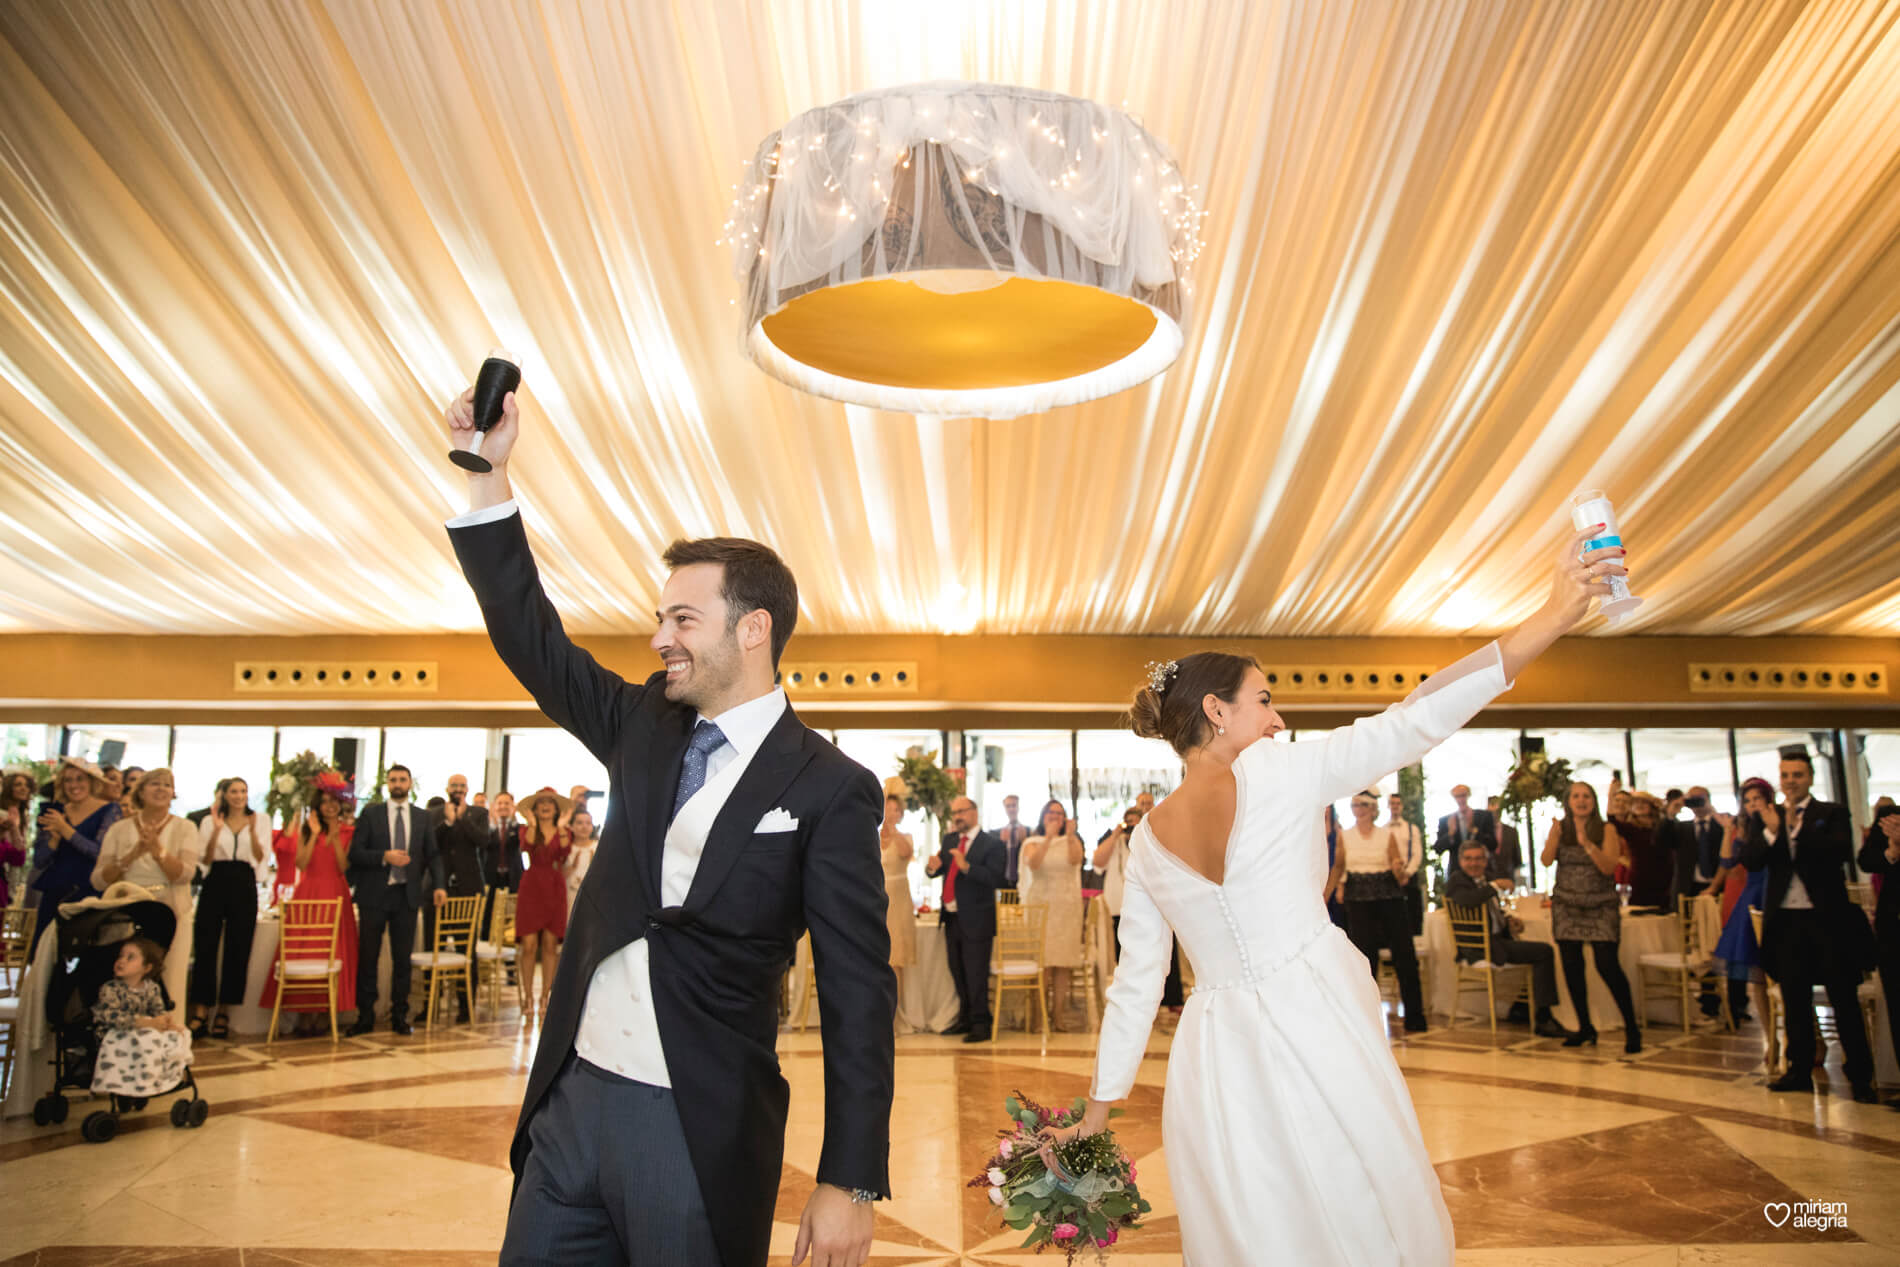 vestido-de-novia-paula-del-vas-miriam-alegria-fotografos-boda-murcia-118